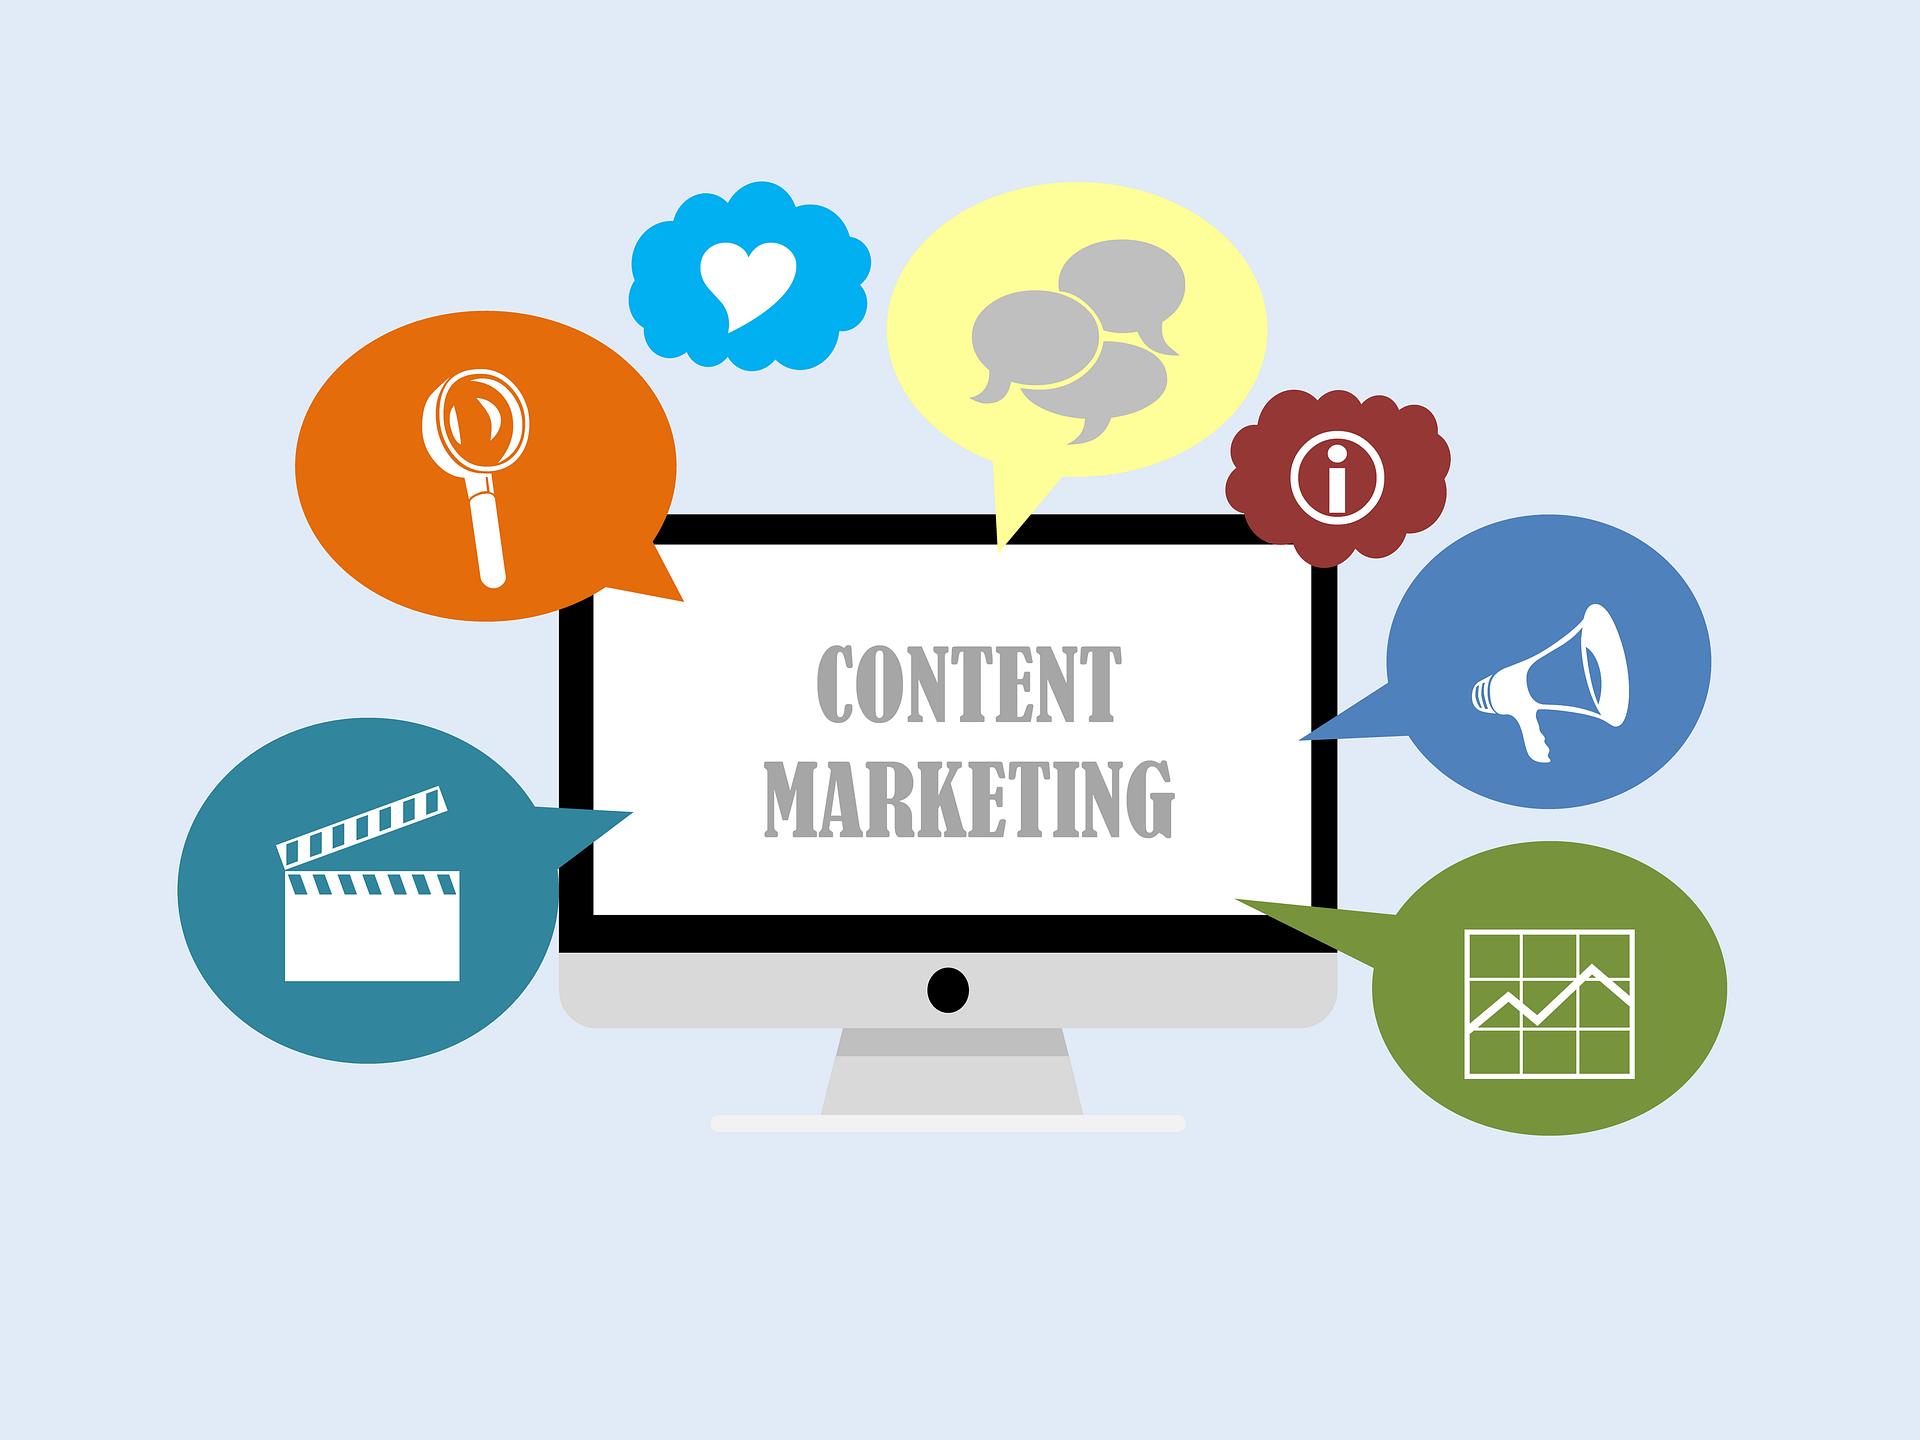 advantages-content-marketing-strategy-digital-marketing-trends